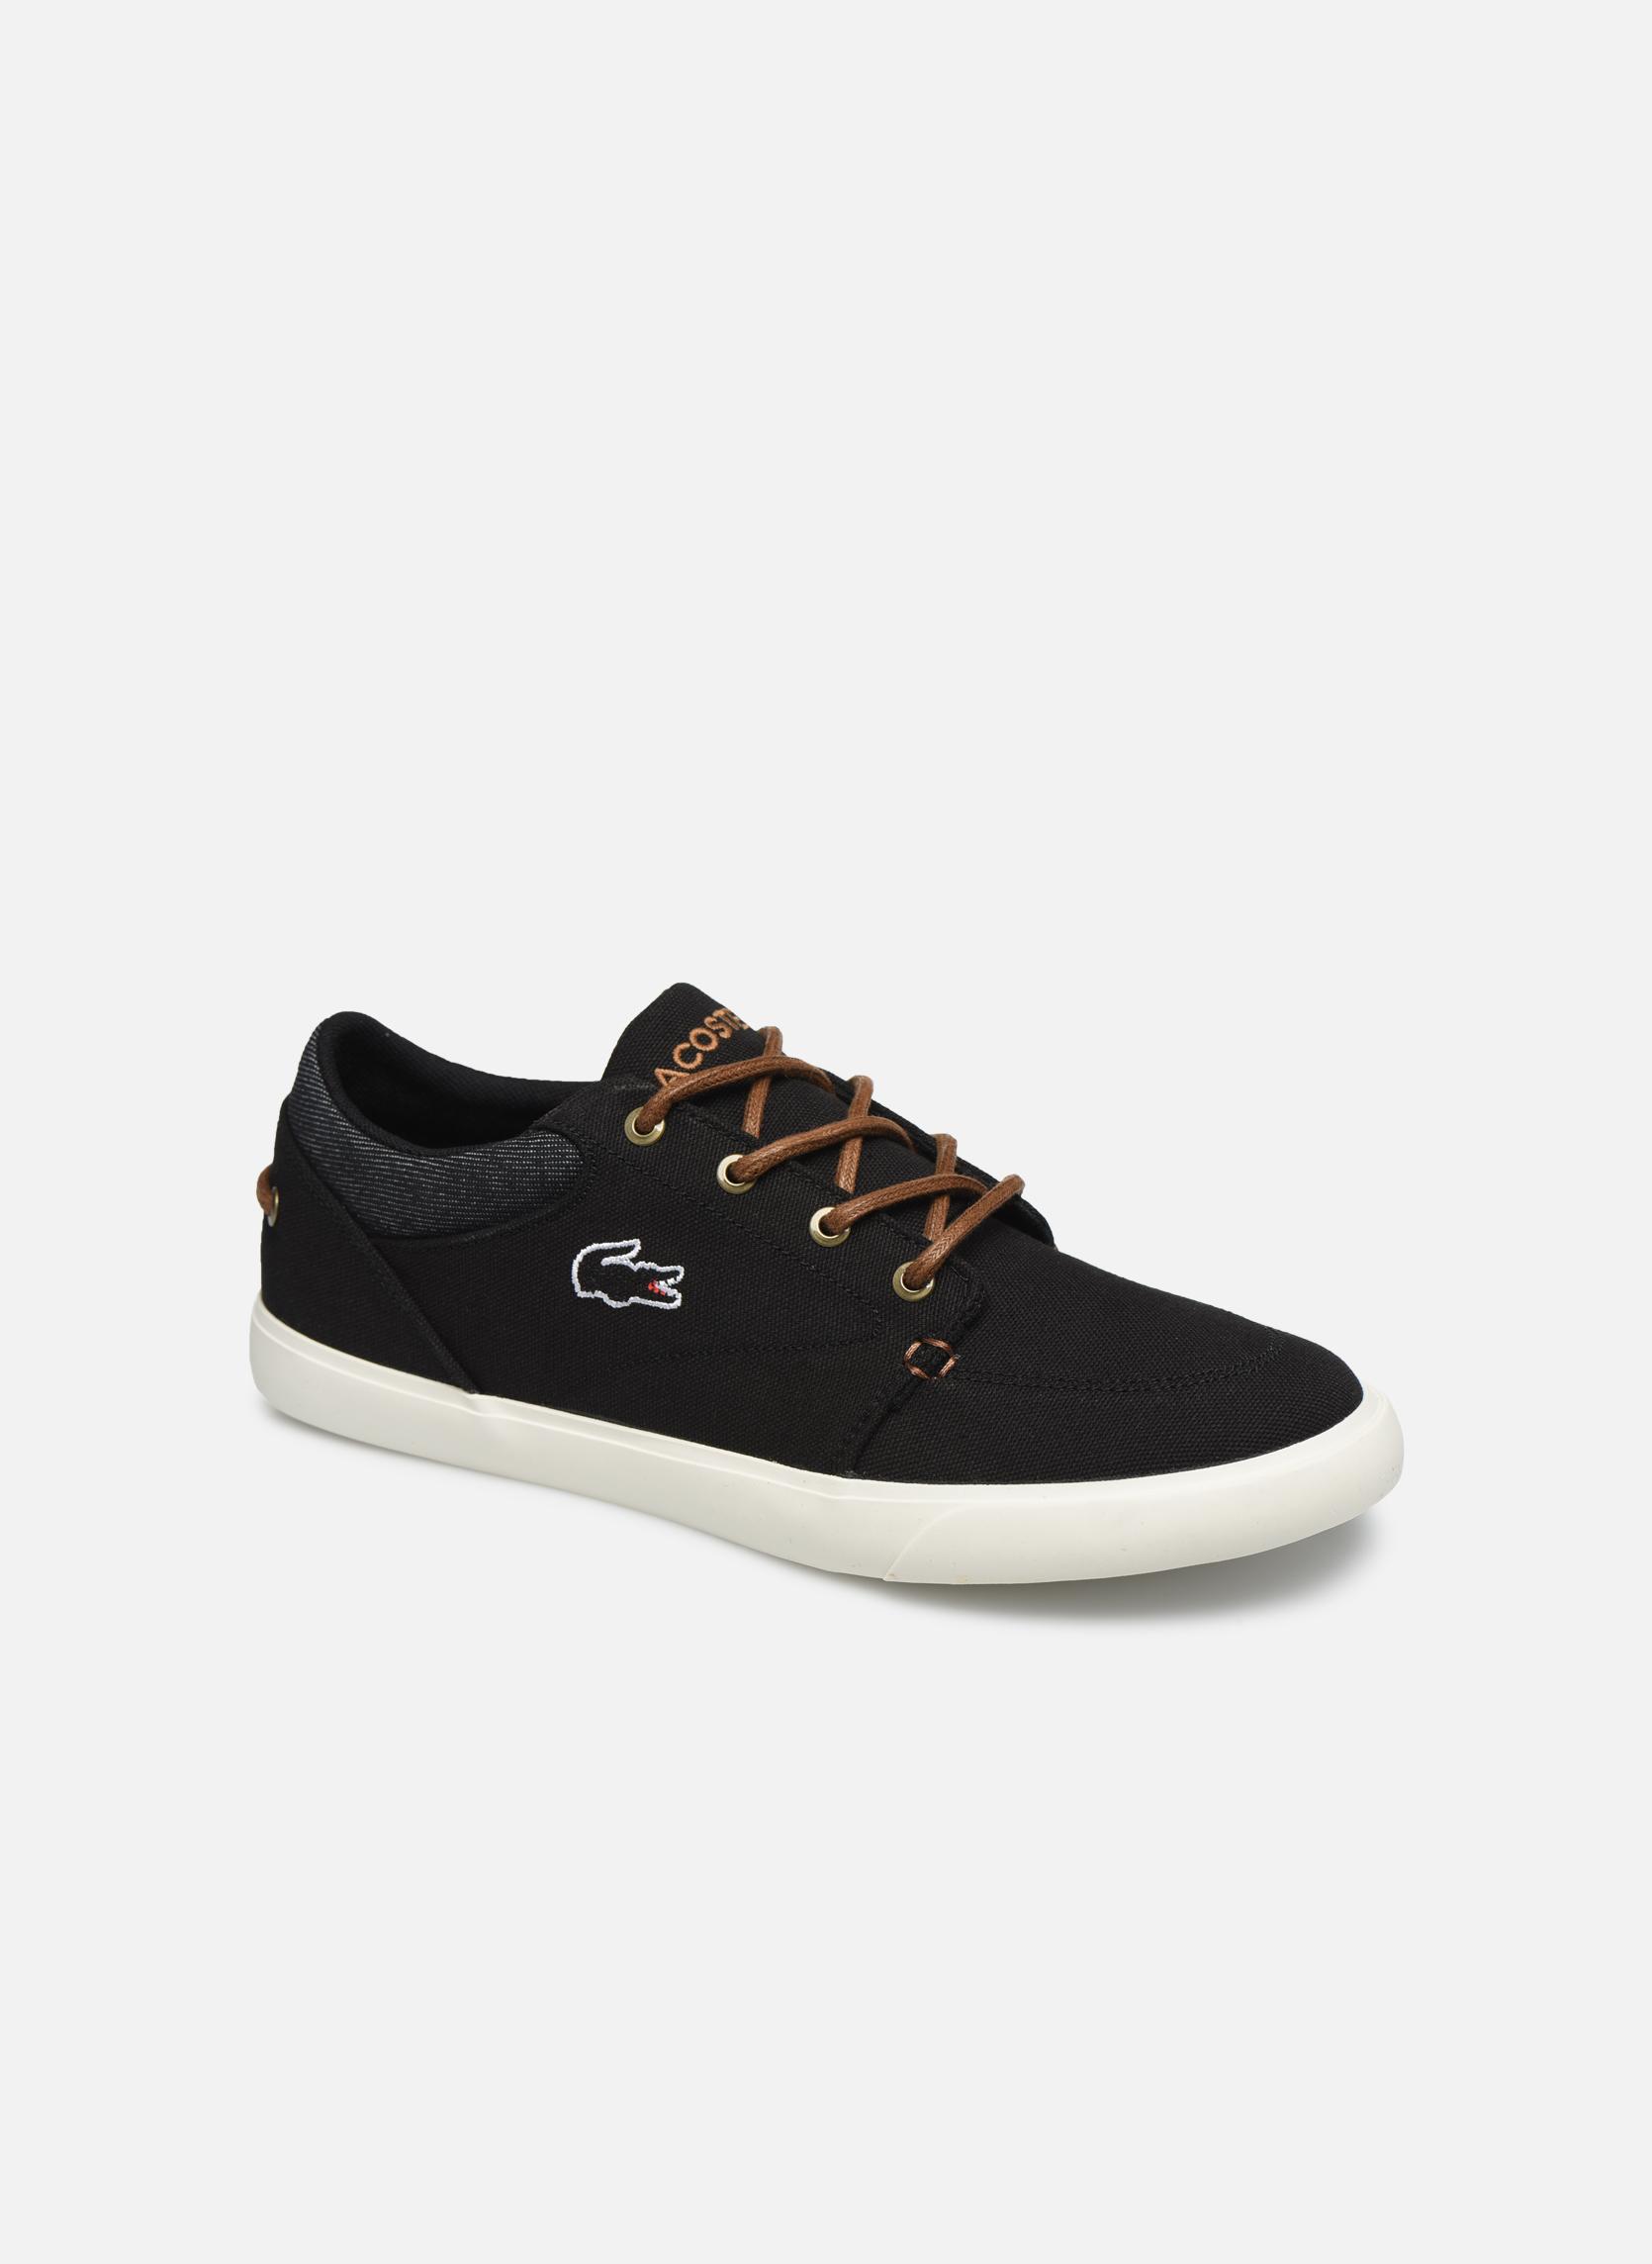 Sneakers Herr BAYLISS VULC 317 2